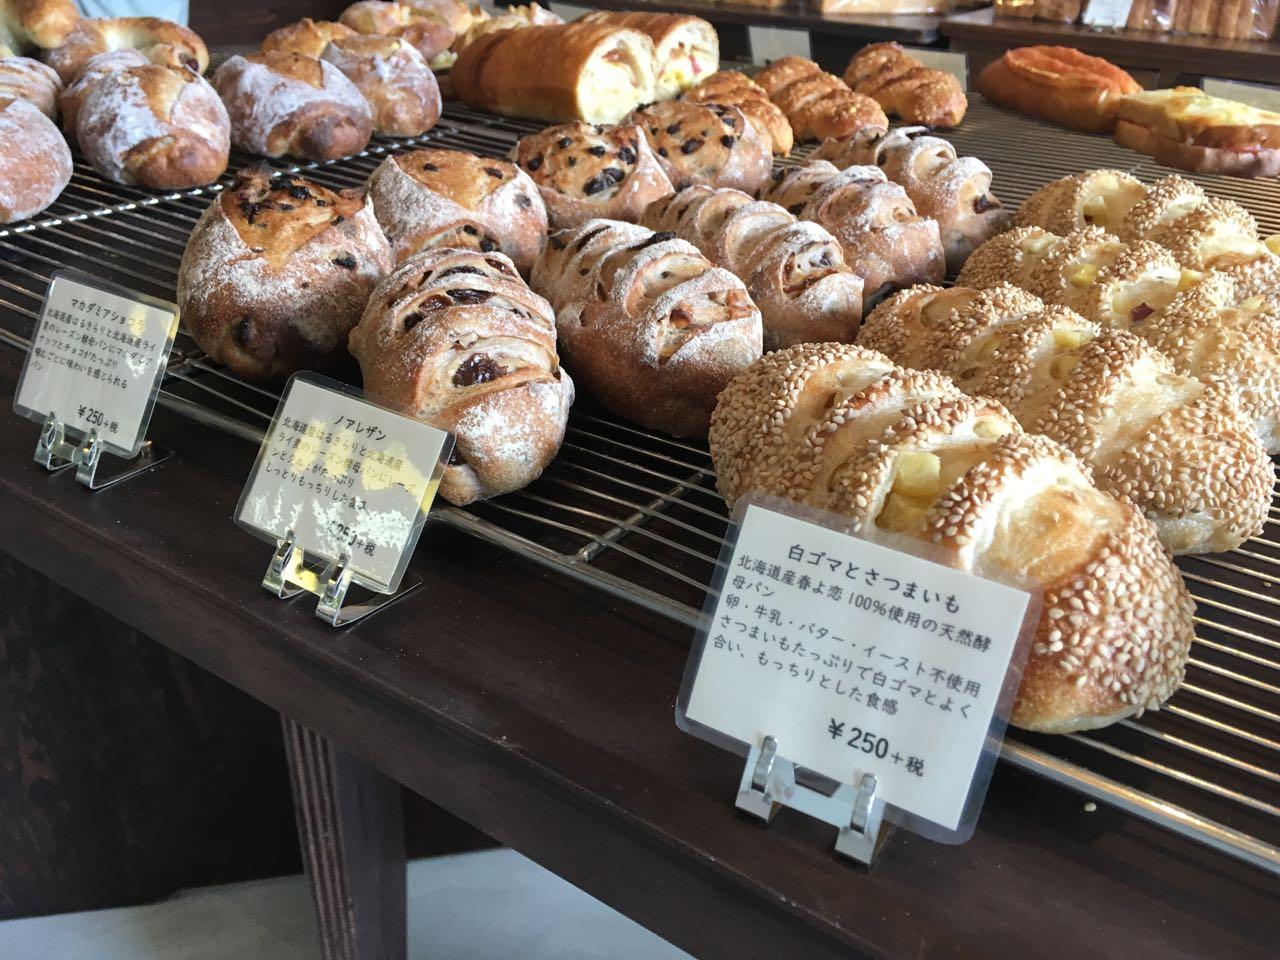 ehime, パンカルチャー, imabari, みとん今治, パン, 今治, 愛媛, 新規オープン